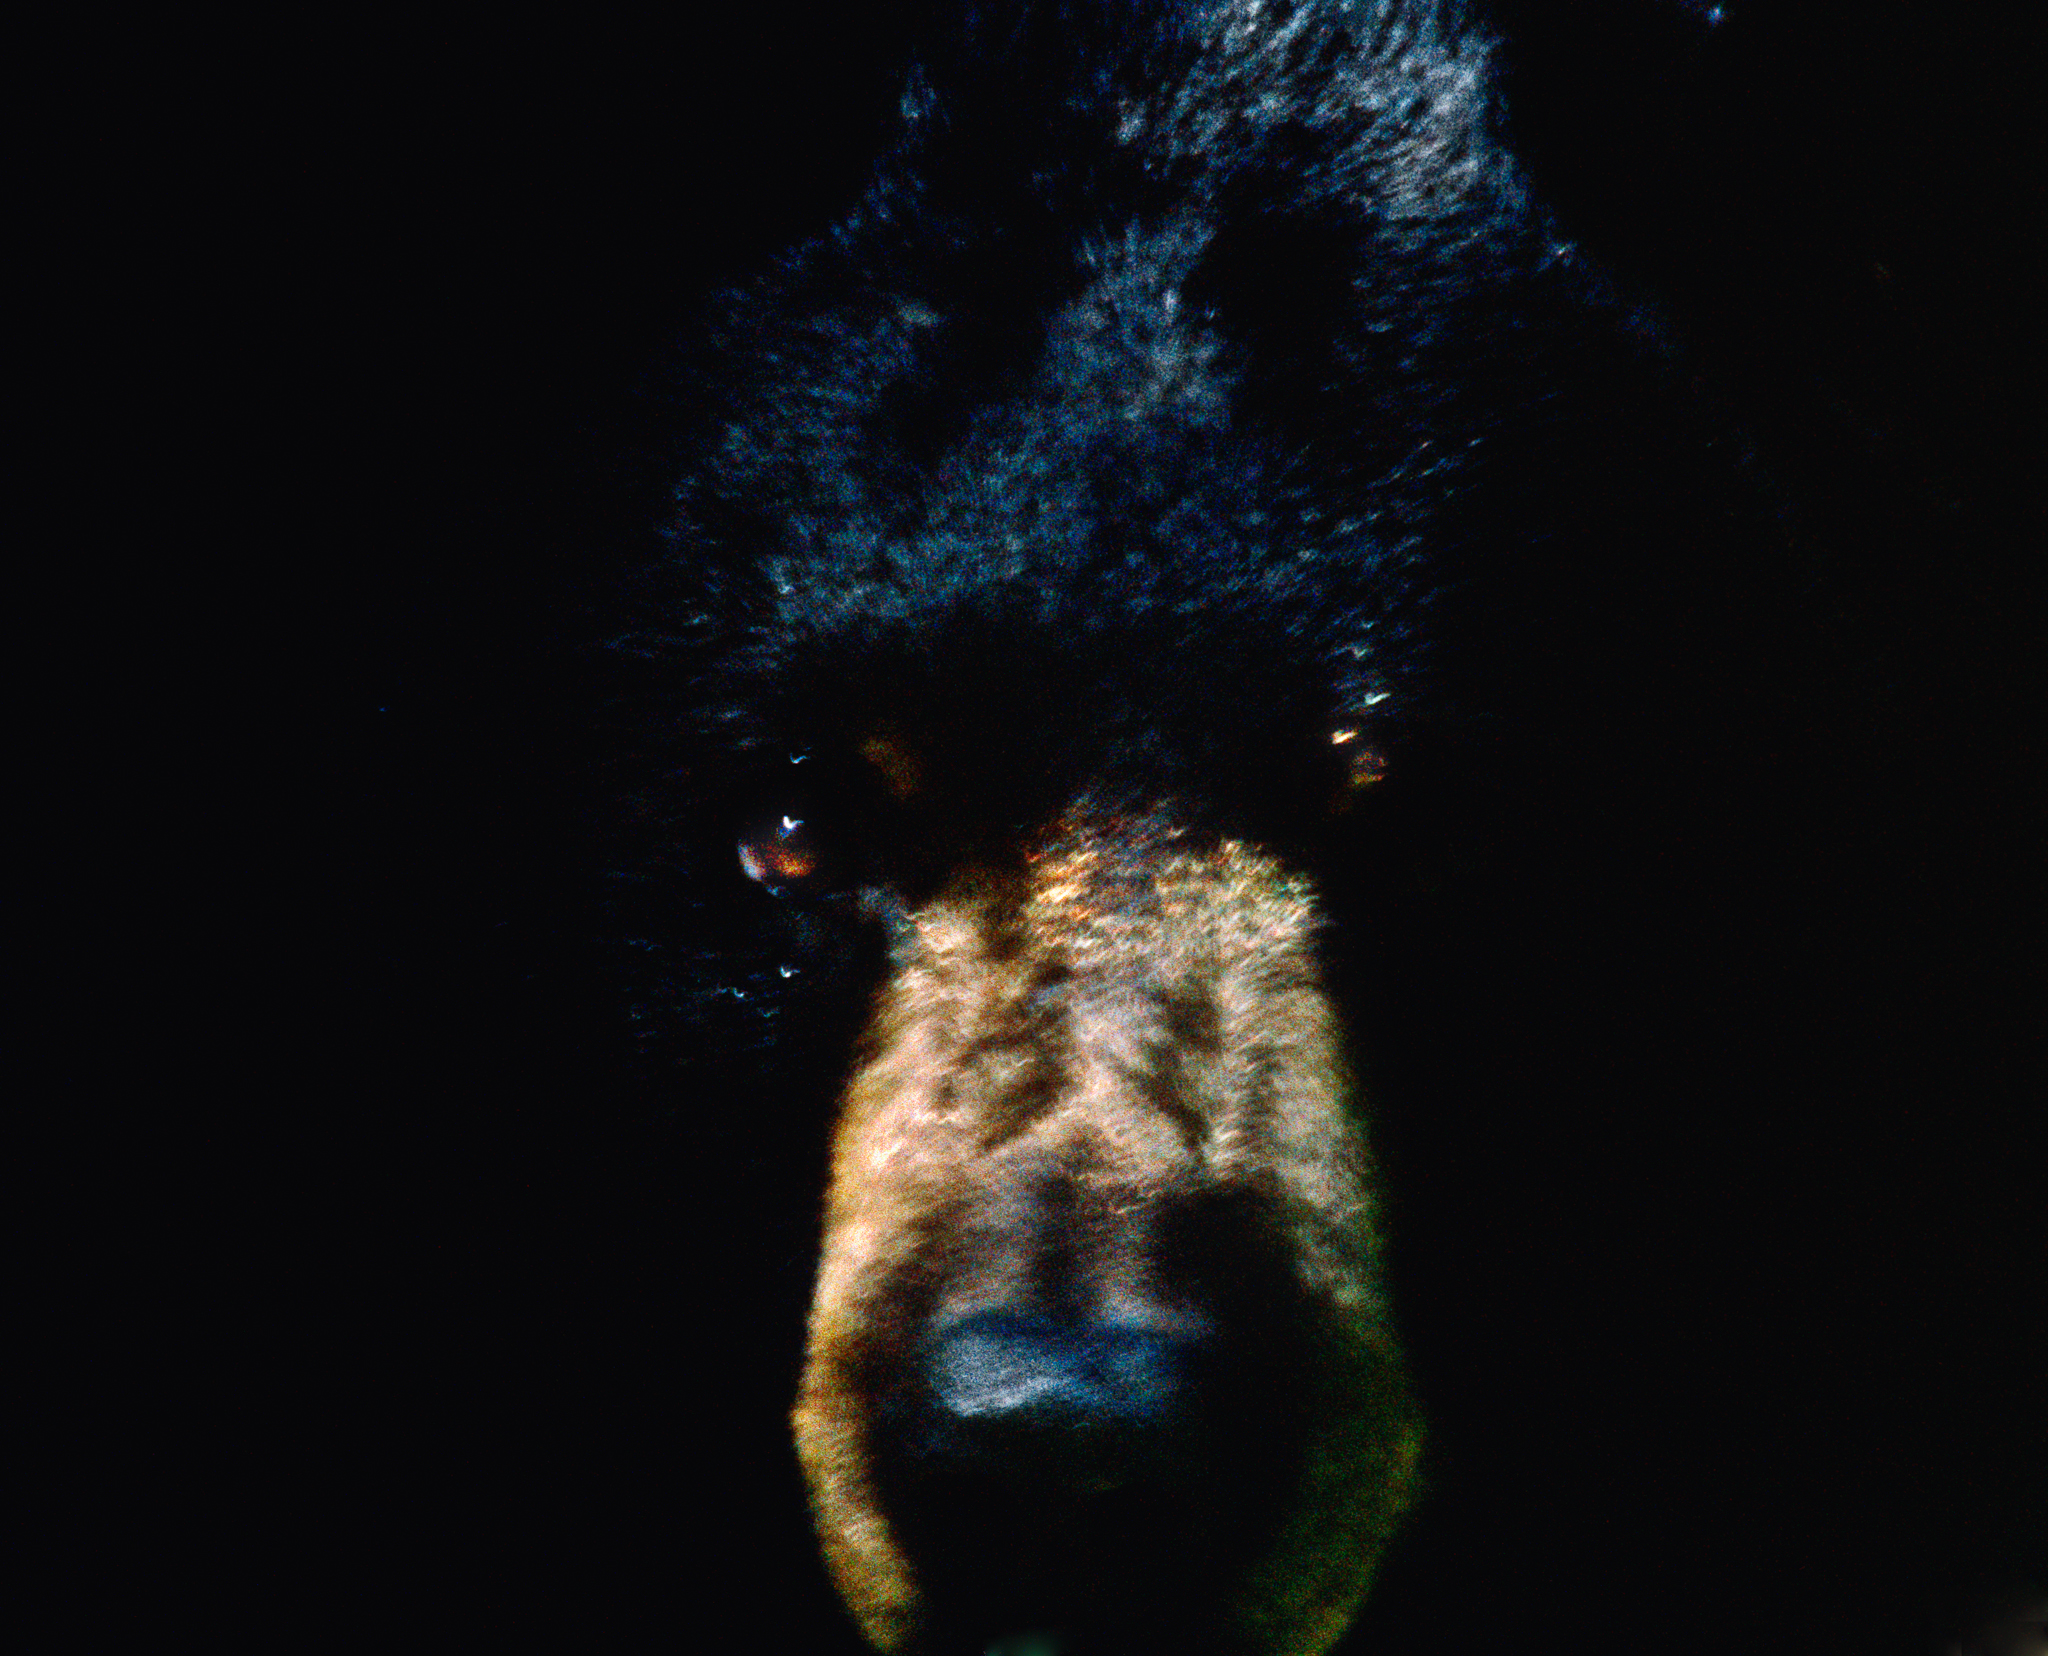 Black Bear Abstract